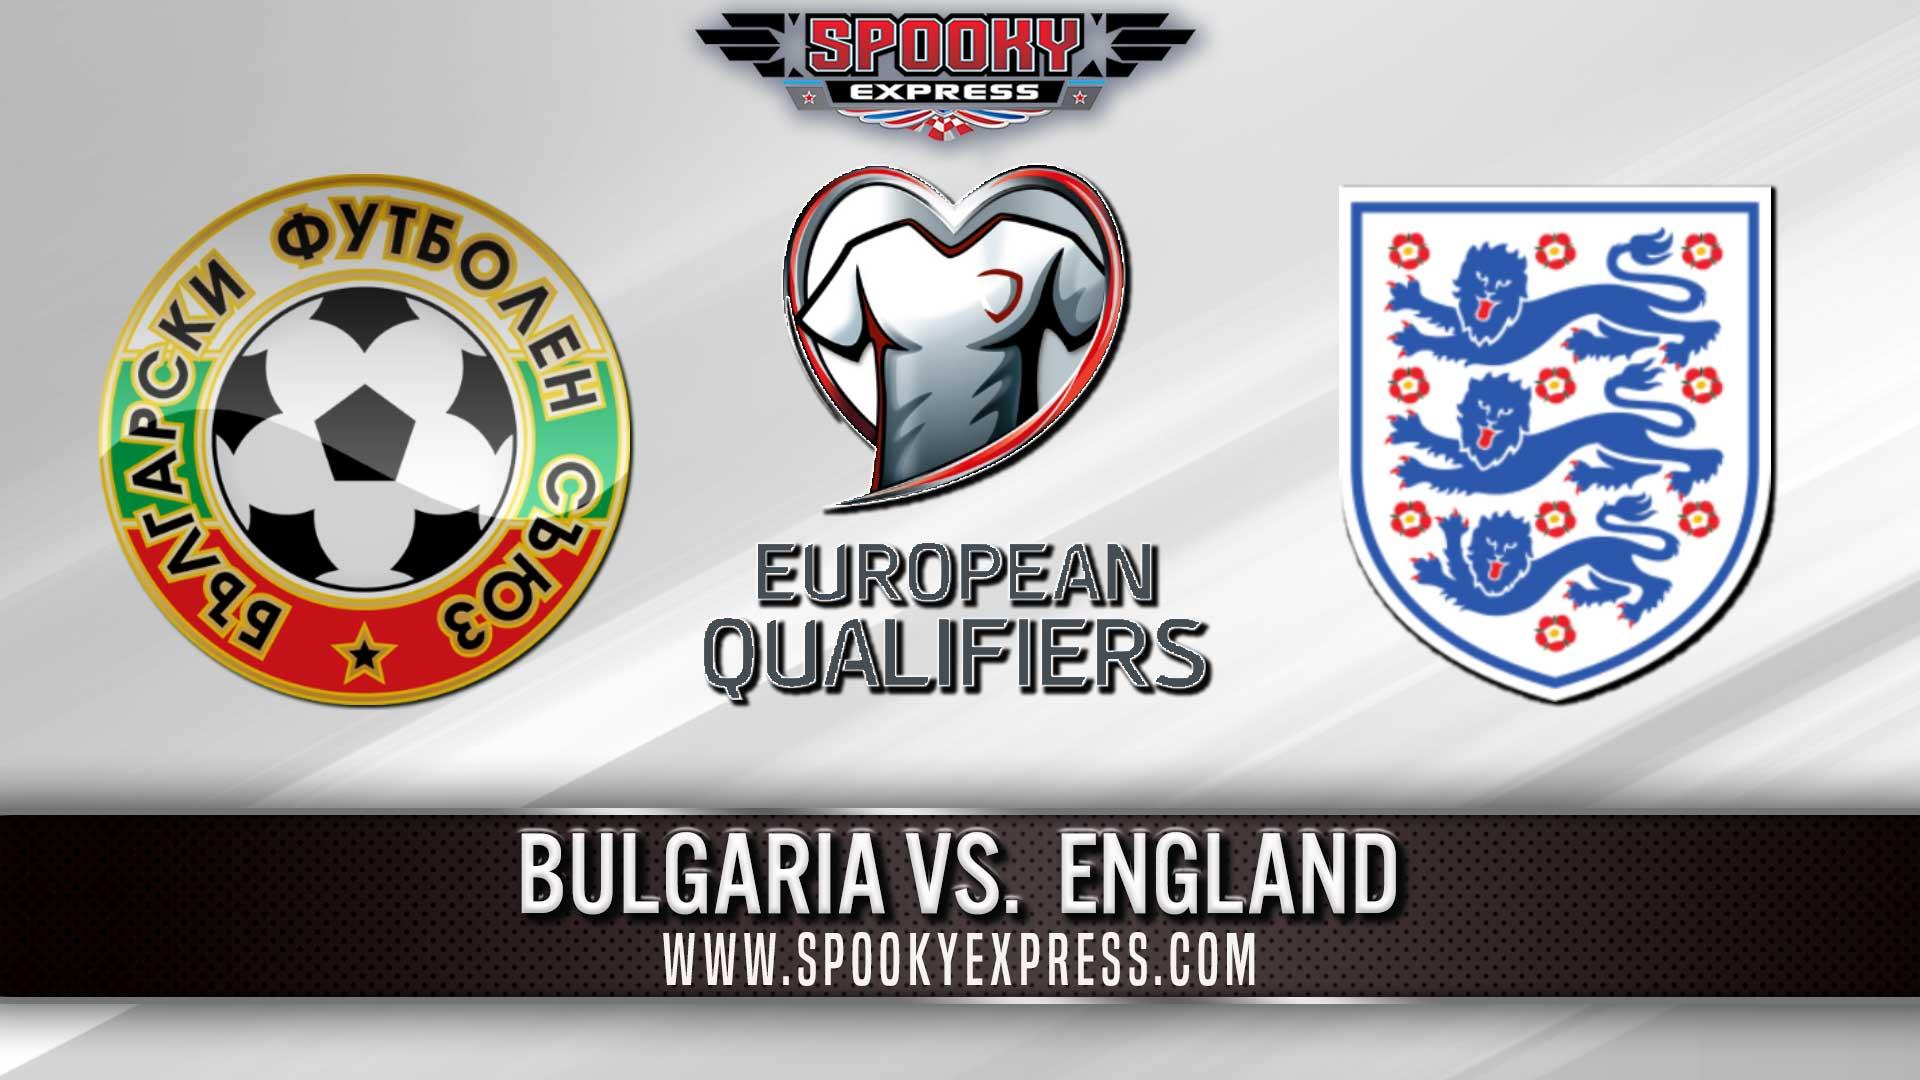 bulgaria vs england - photo #2